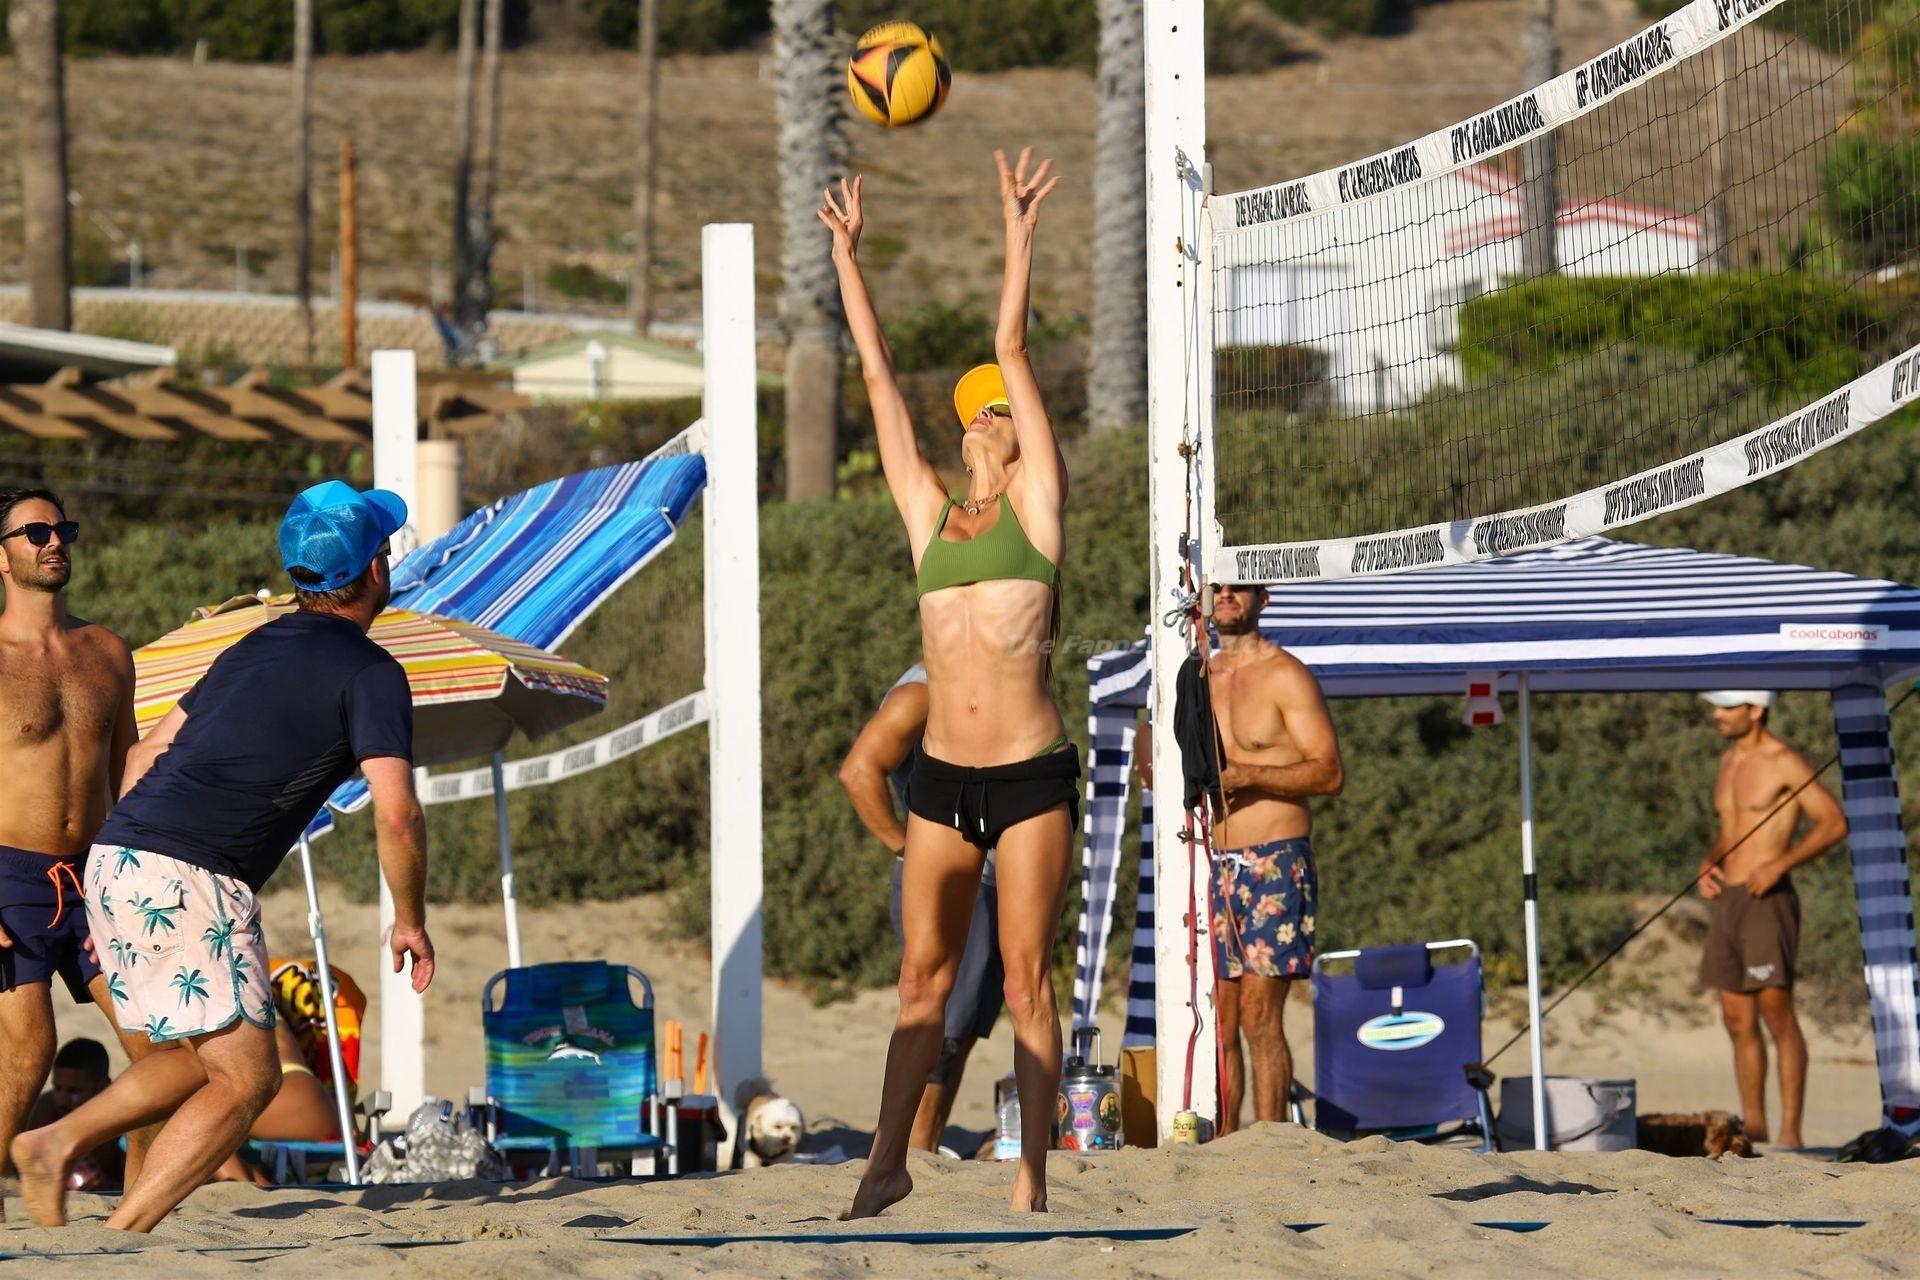 Alessandra Ambrosio Sexy on Beach 92